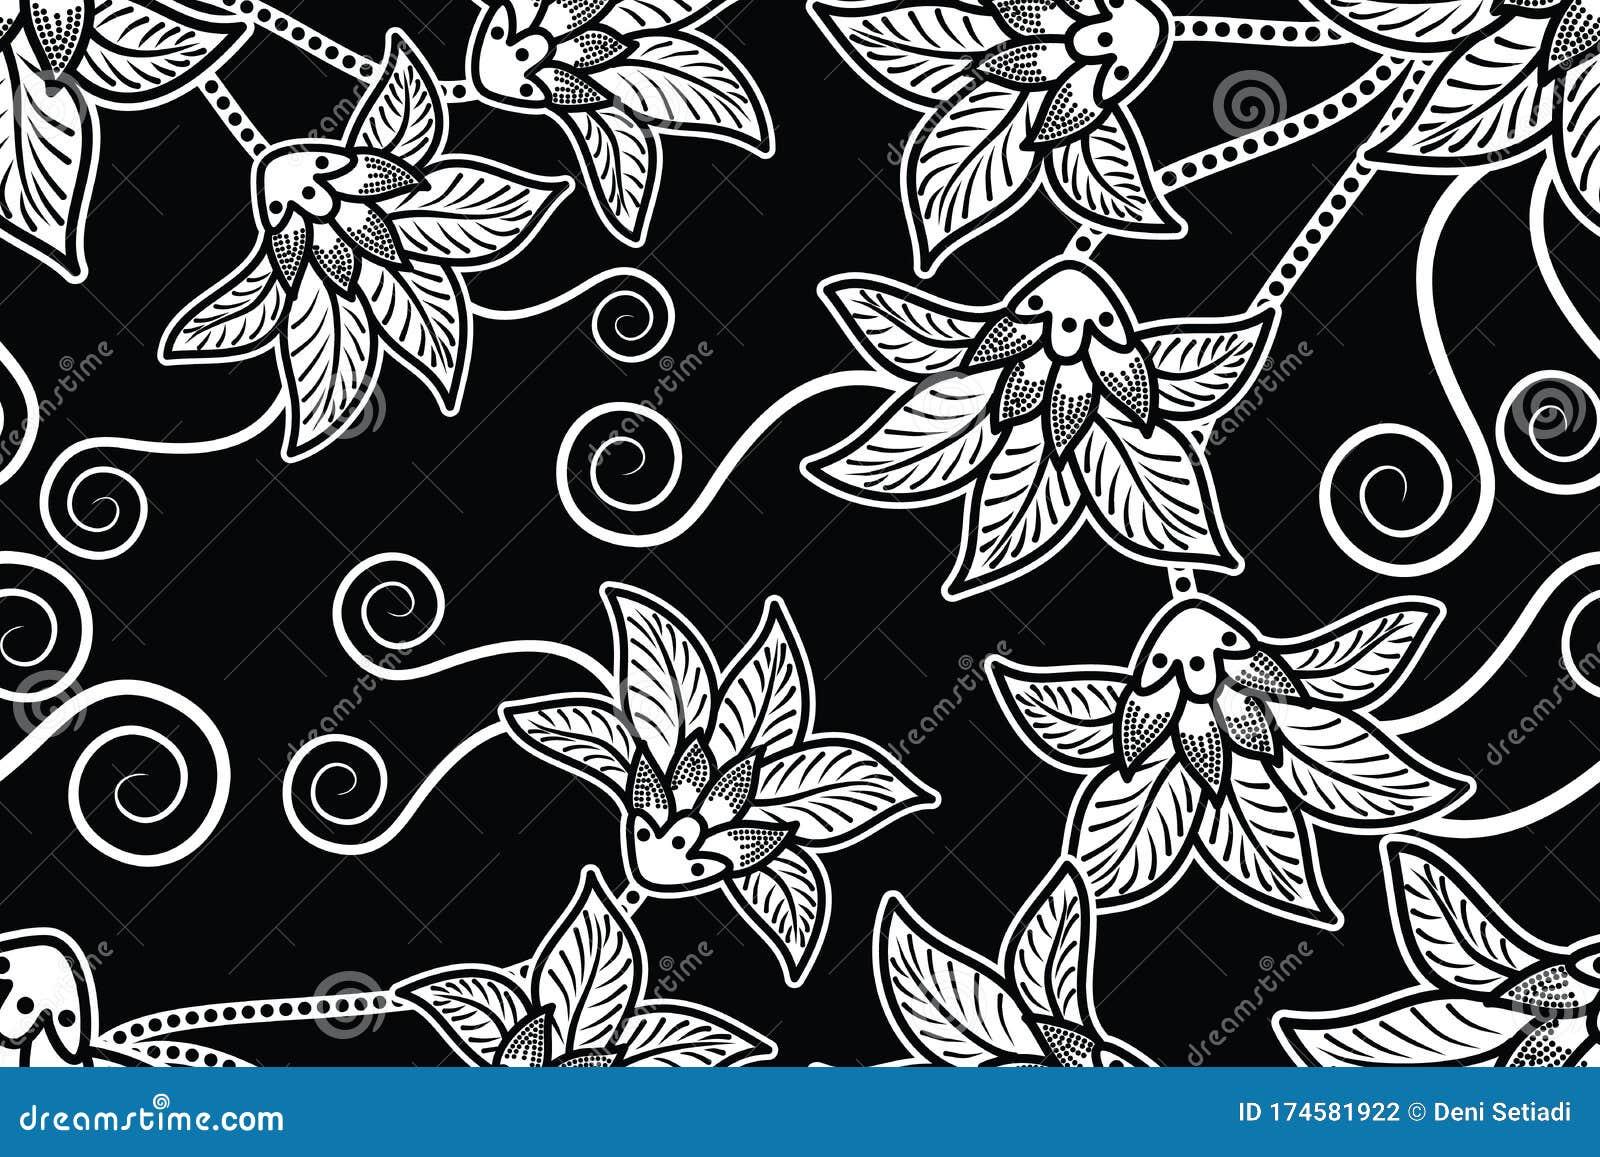 Seamless Pattern with Floral Vector Illustration, Modern Batik ...